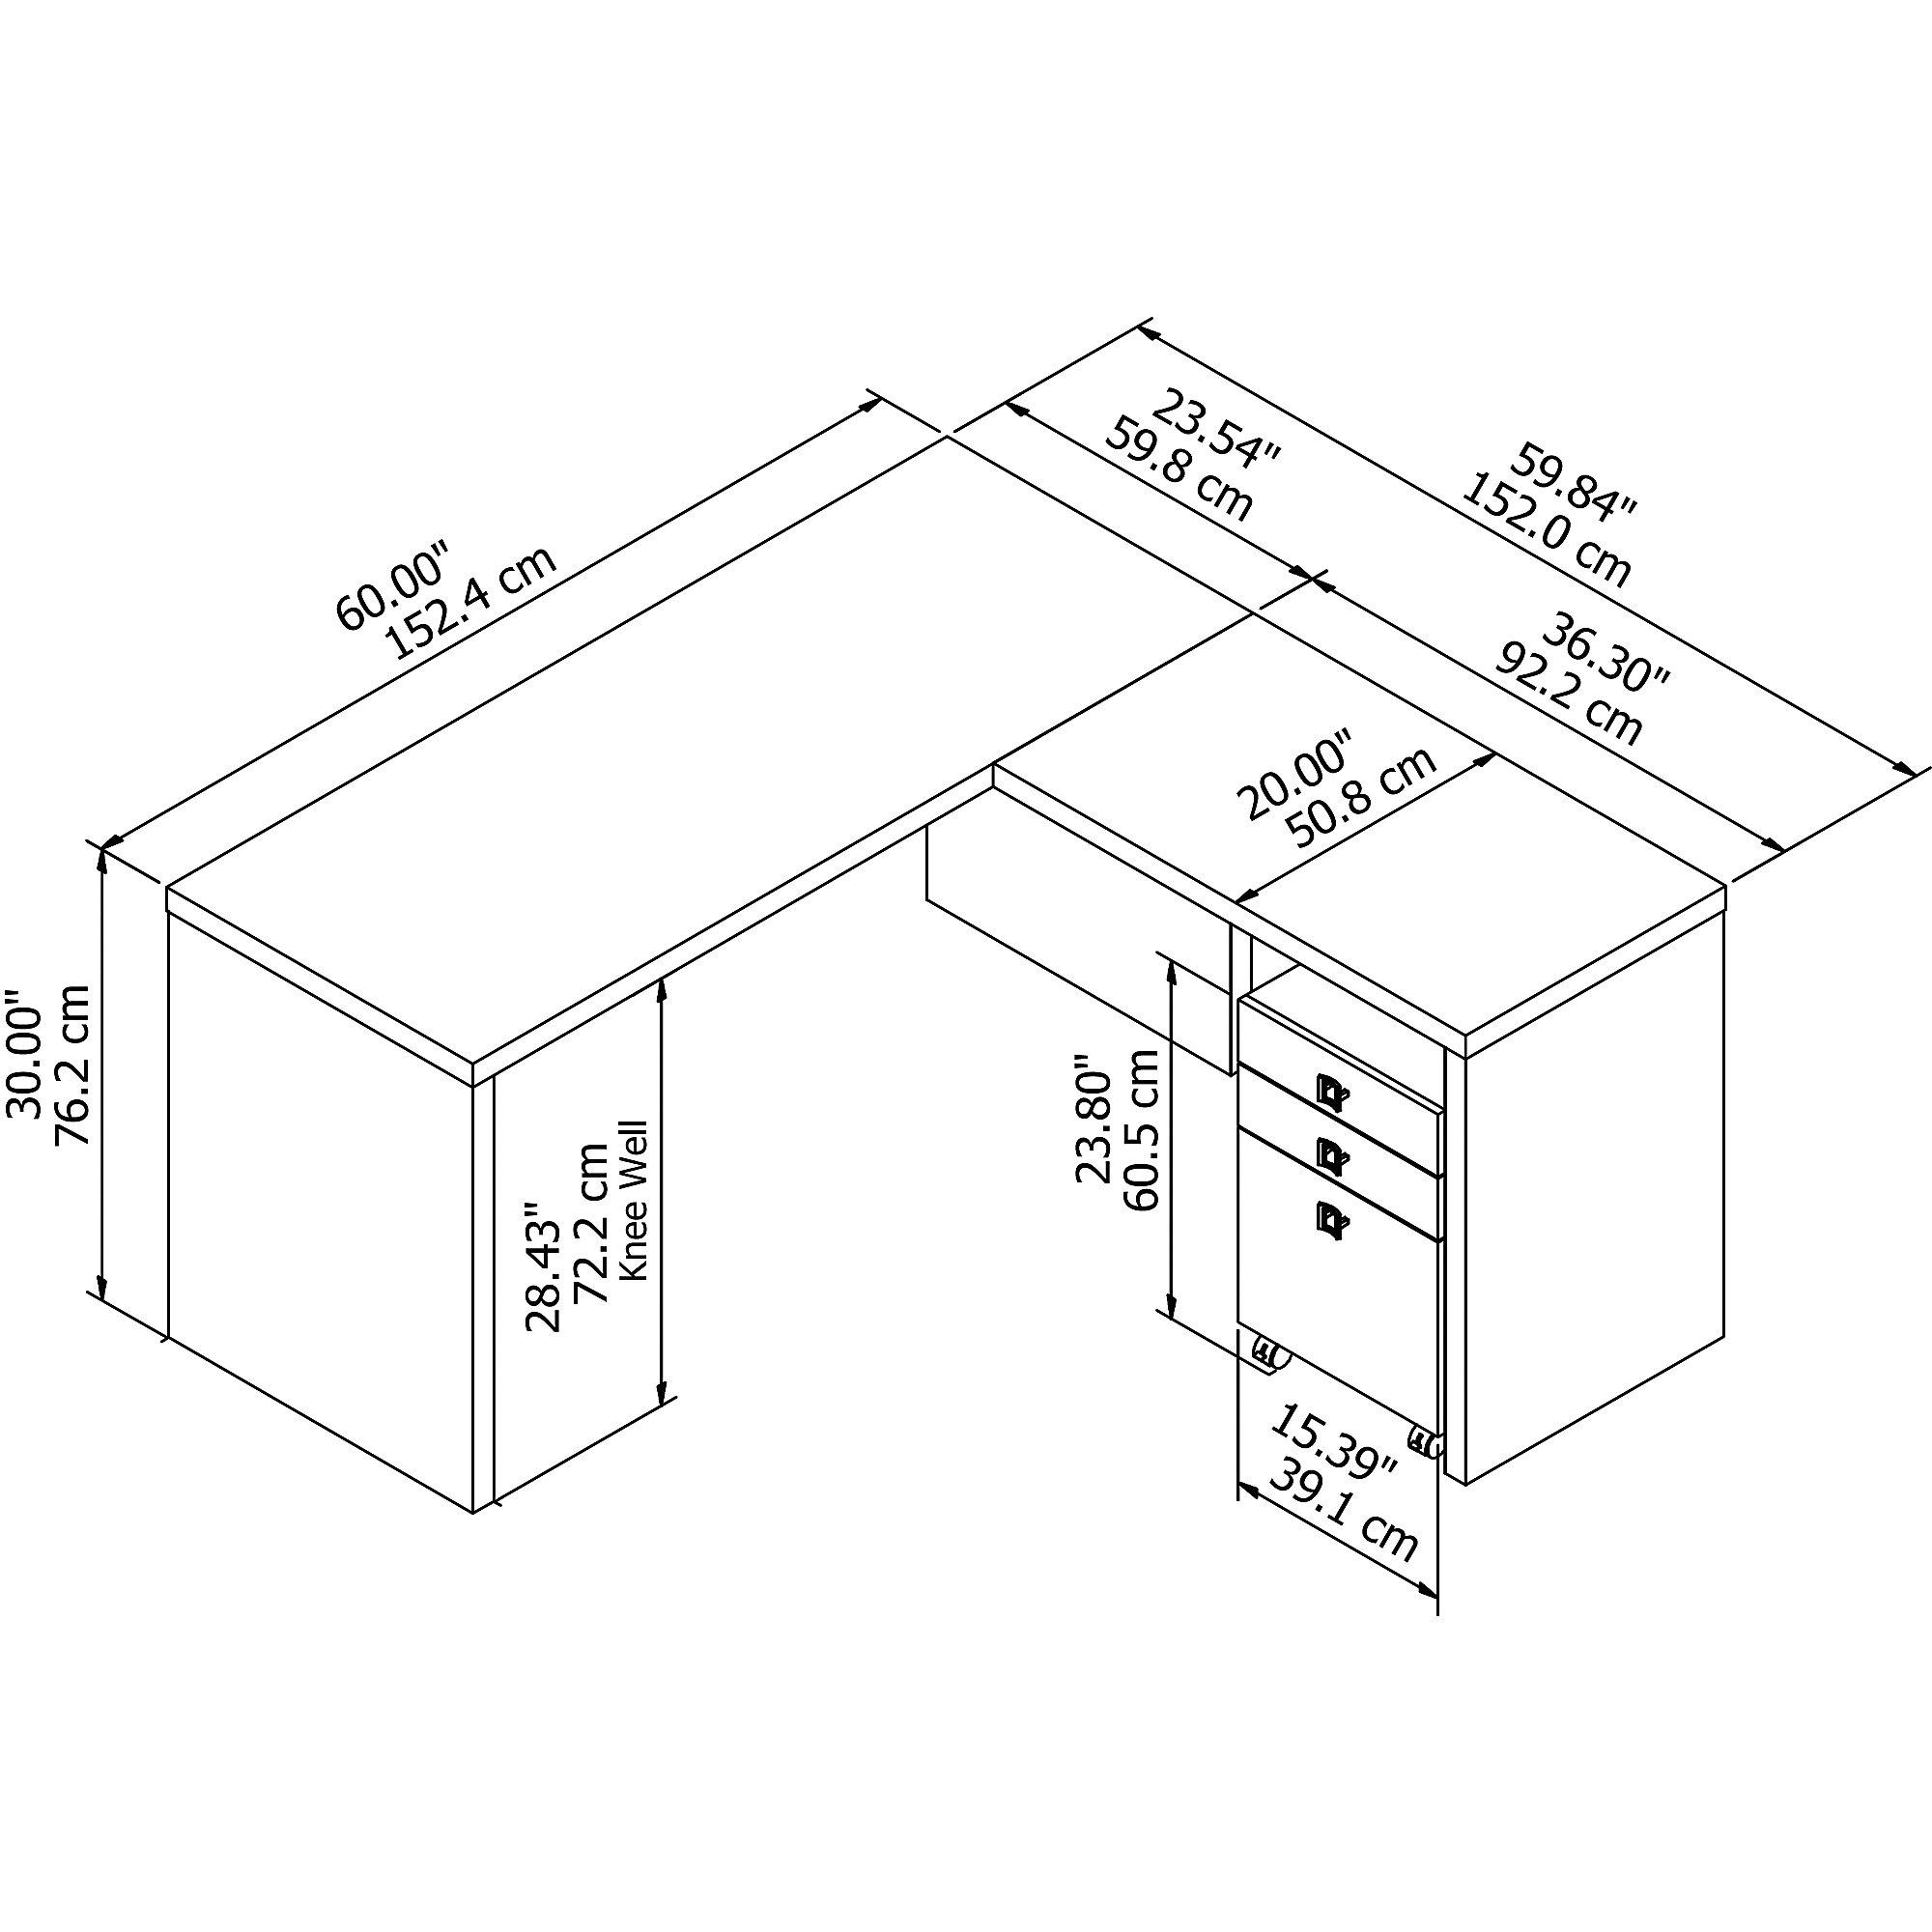 ech008 desk dimensions